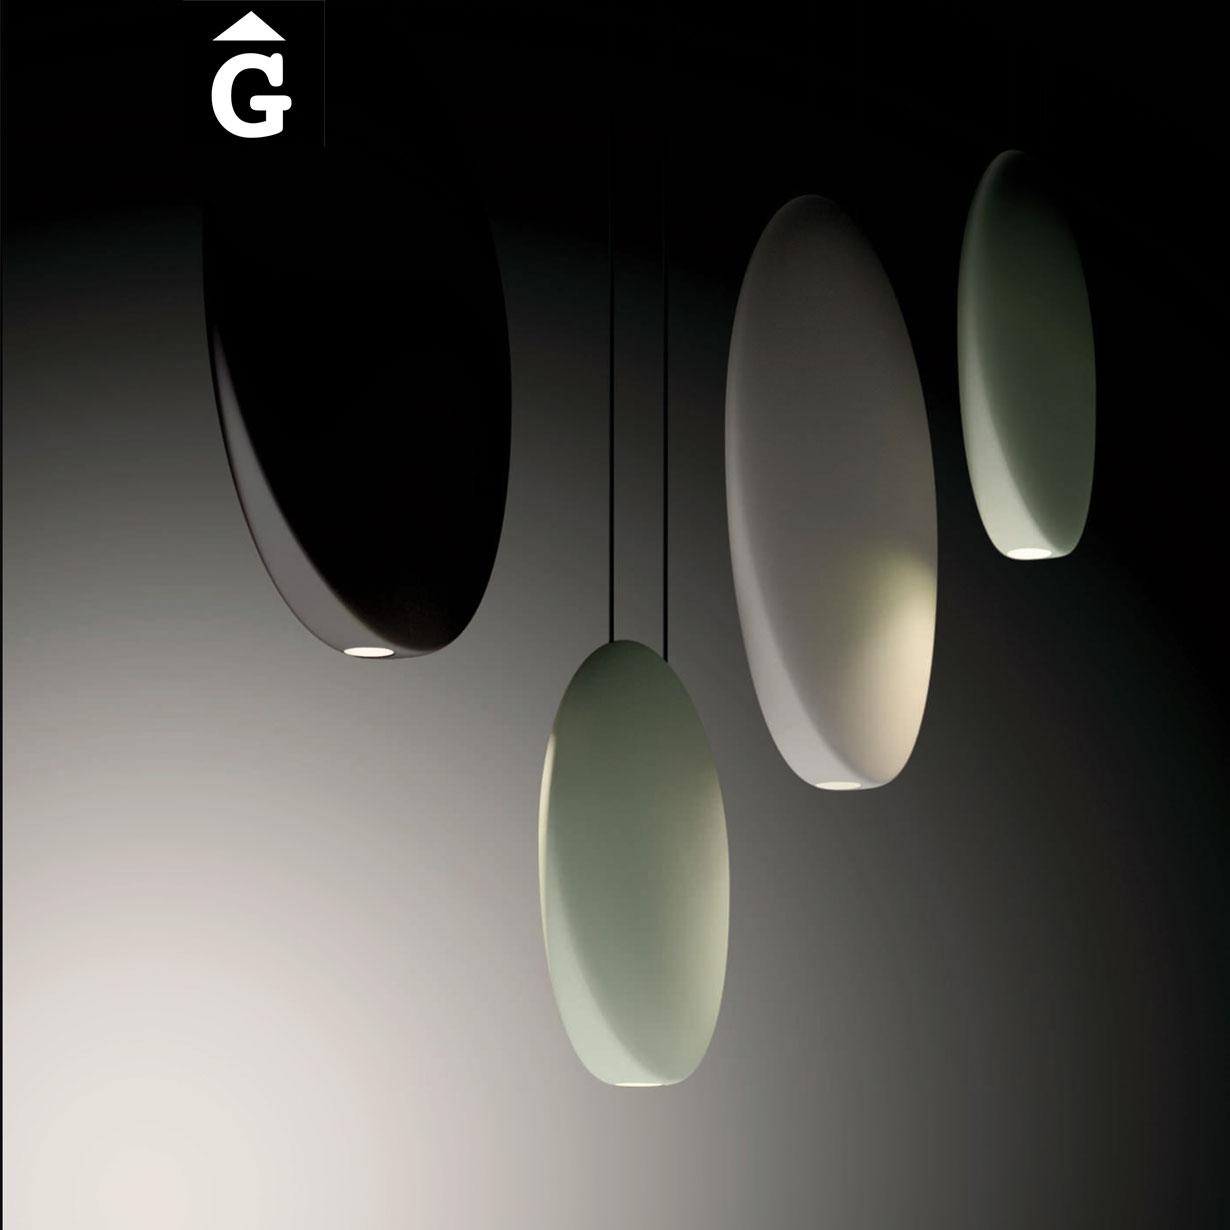 Il·luminació Interior